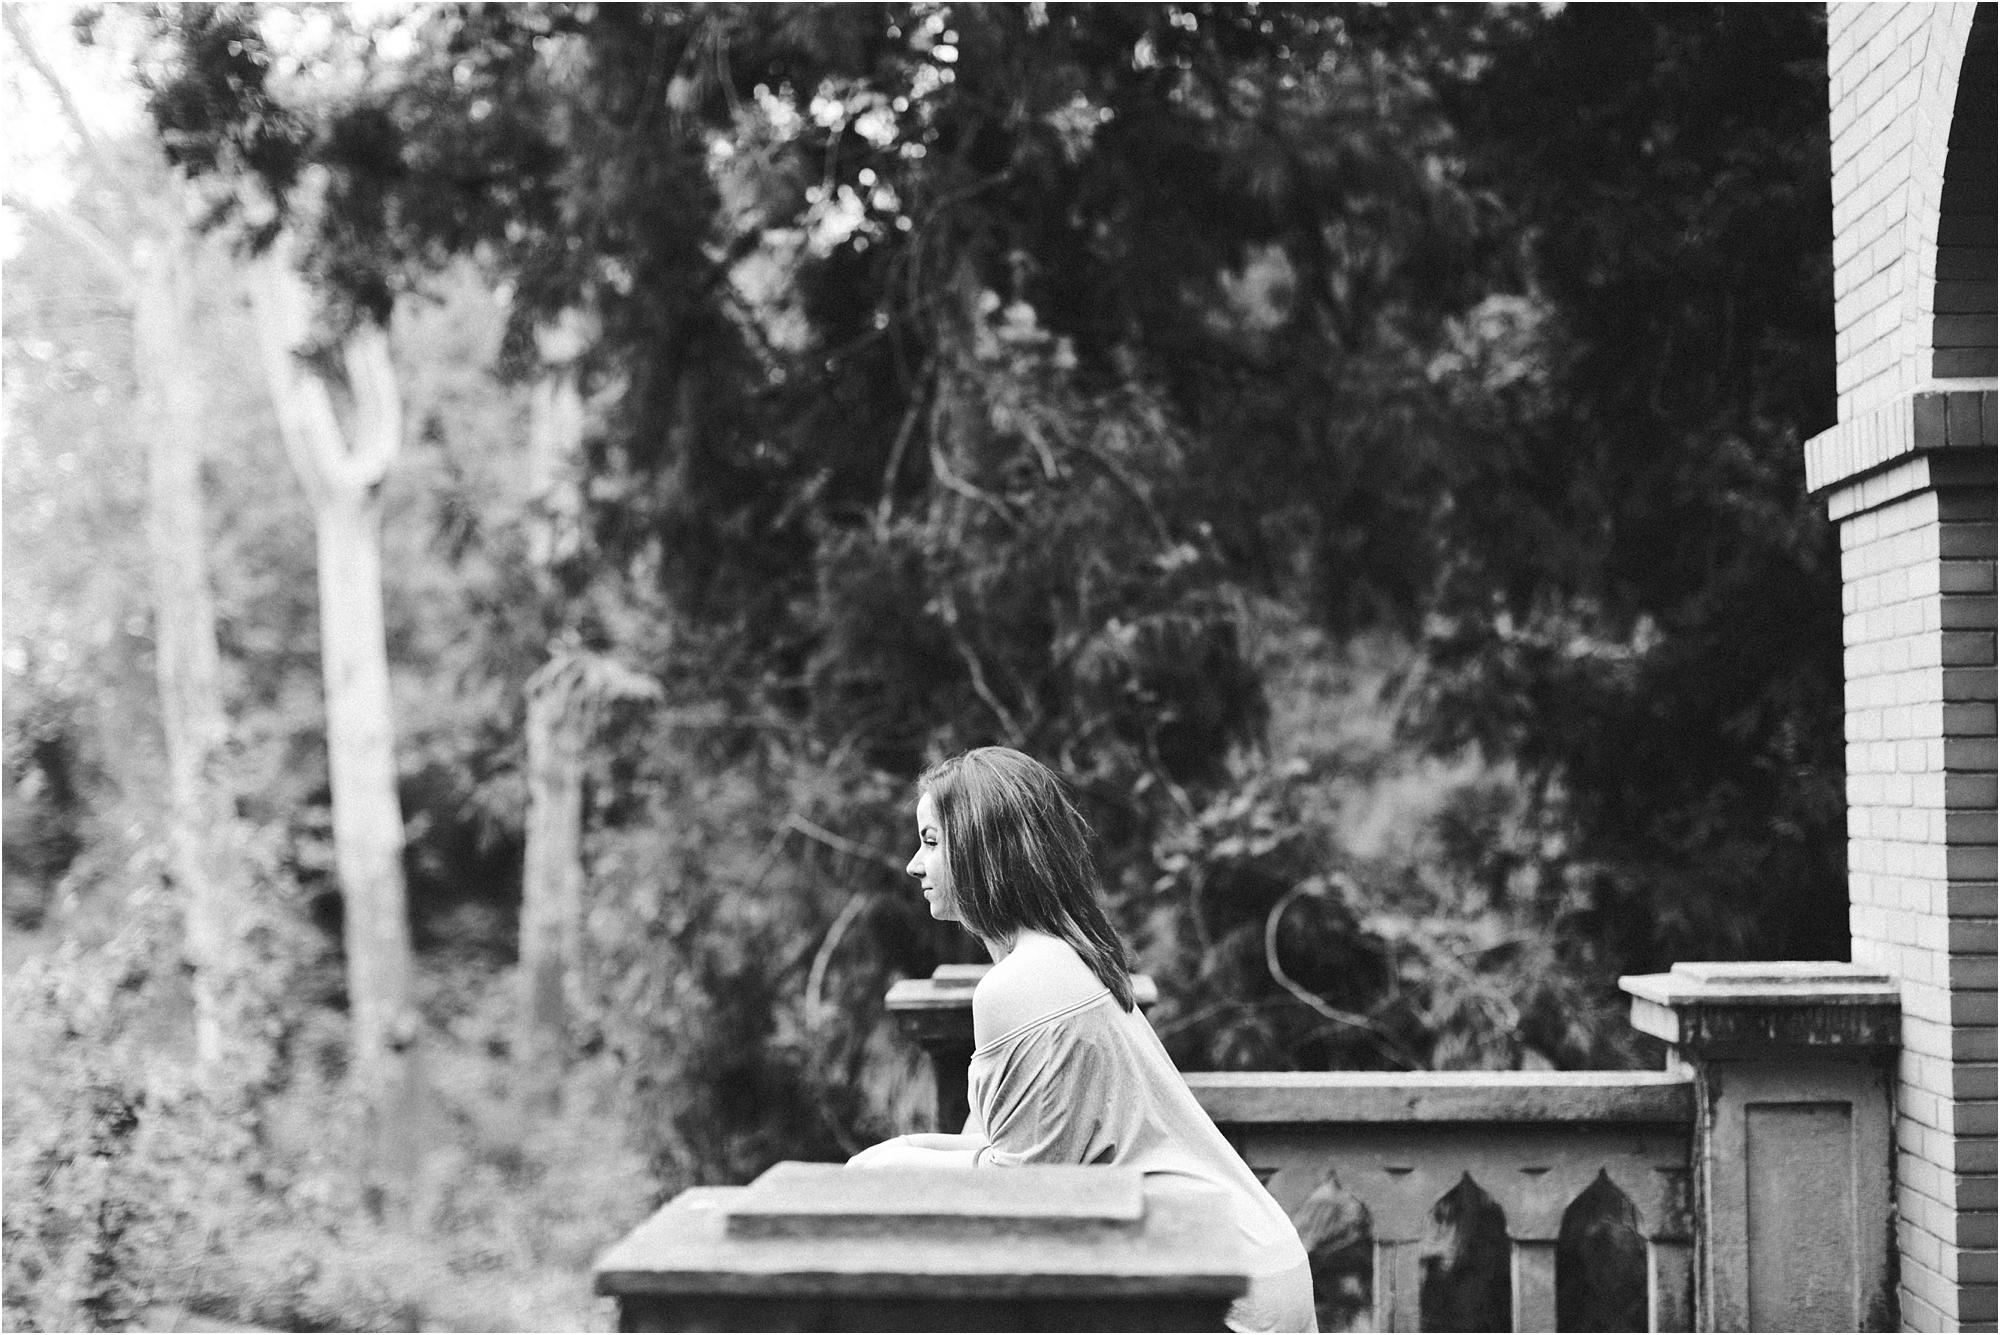 stephanie-yonce-photography-rocha-family-washington-dc-lifestyle-portrait-photos_0016.jpg